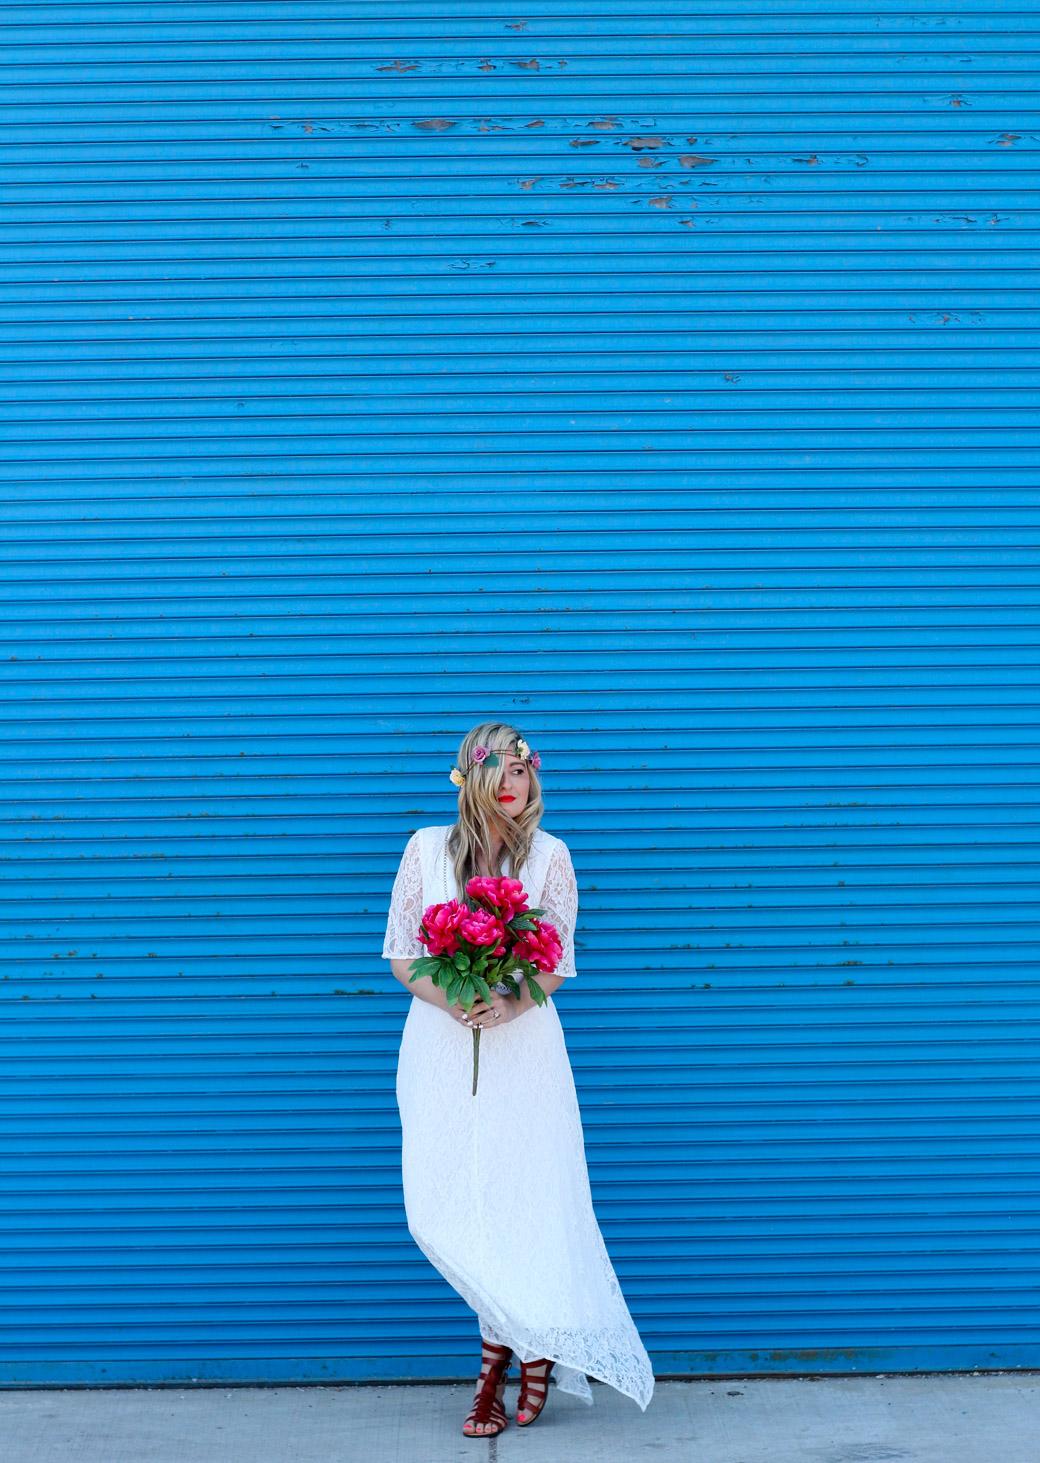 modcloth-wedding-dress-chicago-fashion-blogger-10